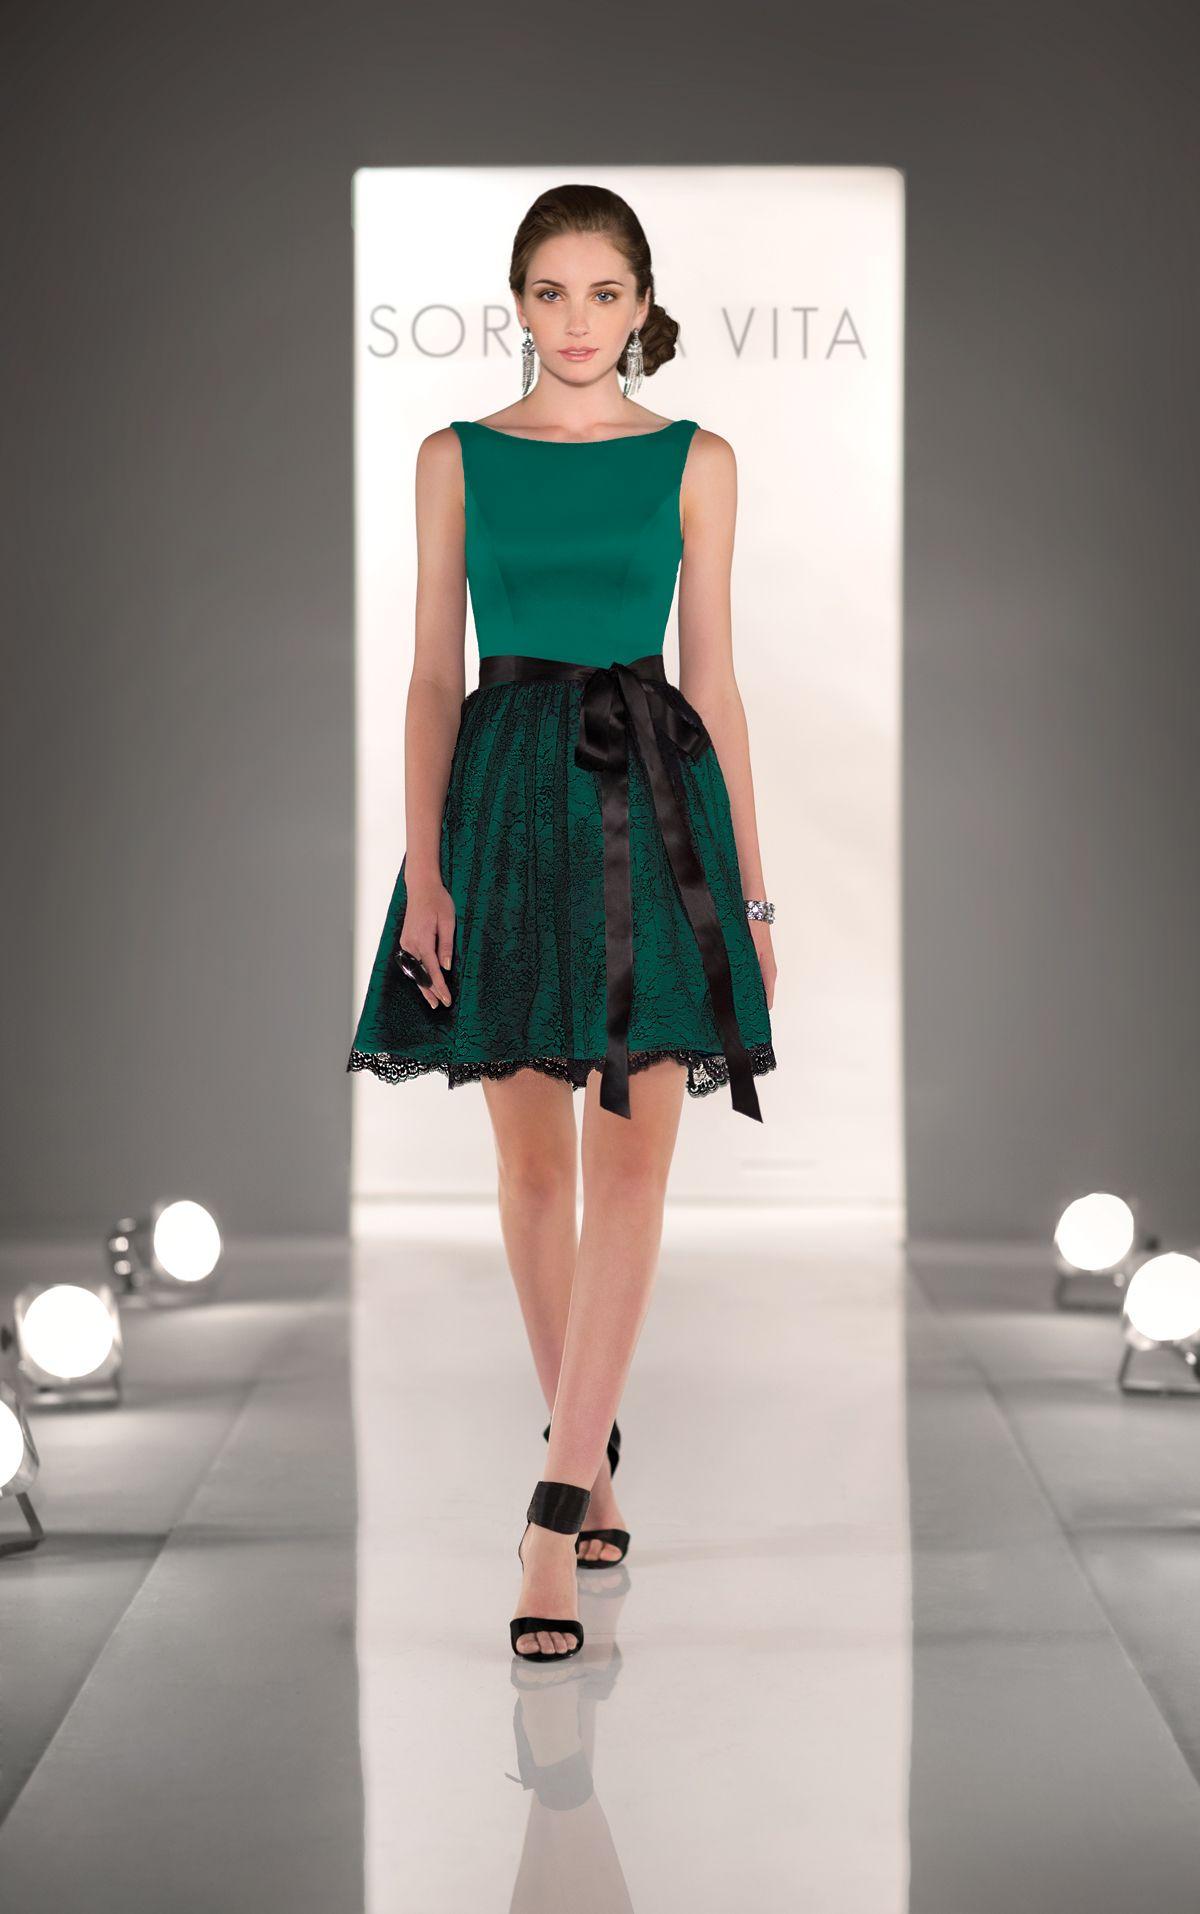 Royal blue lace dress styles  Sorella Vita   Short Dresses  Pinterest  Jade Australia and